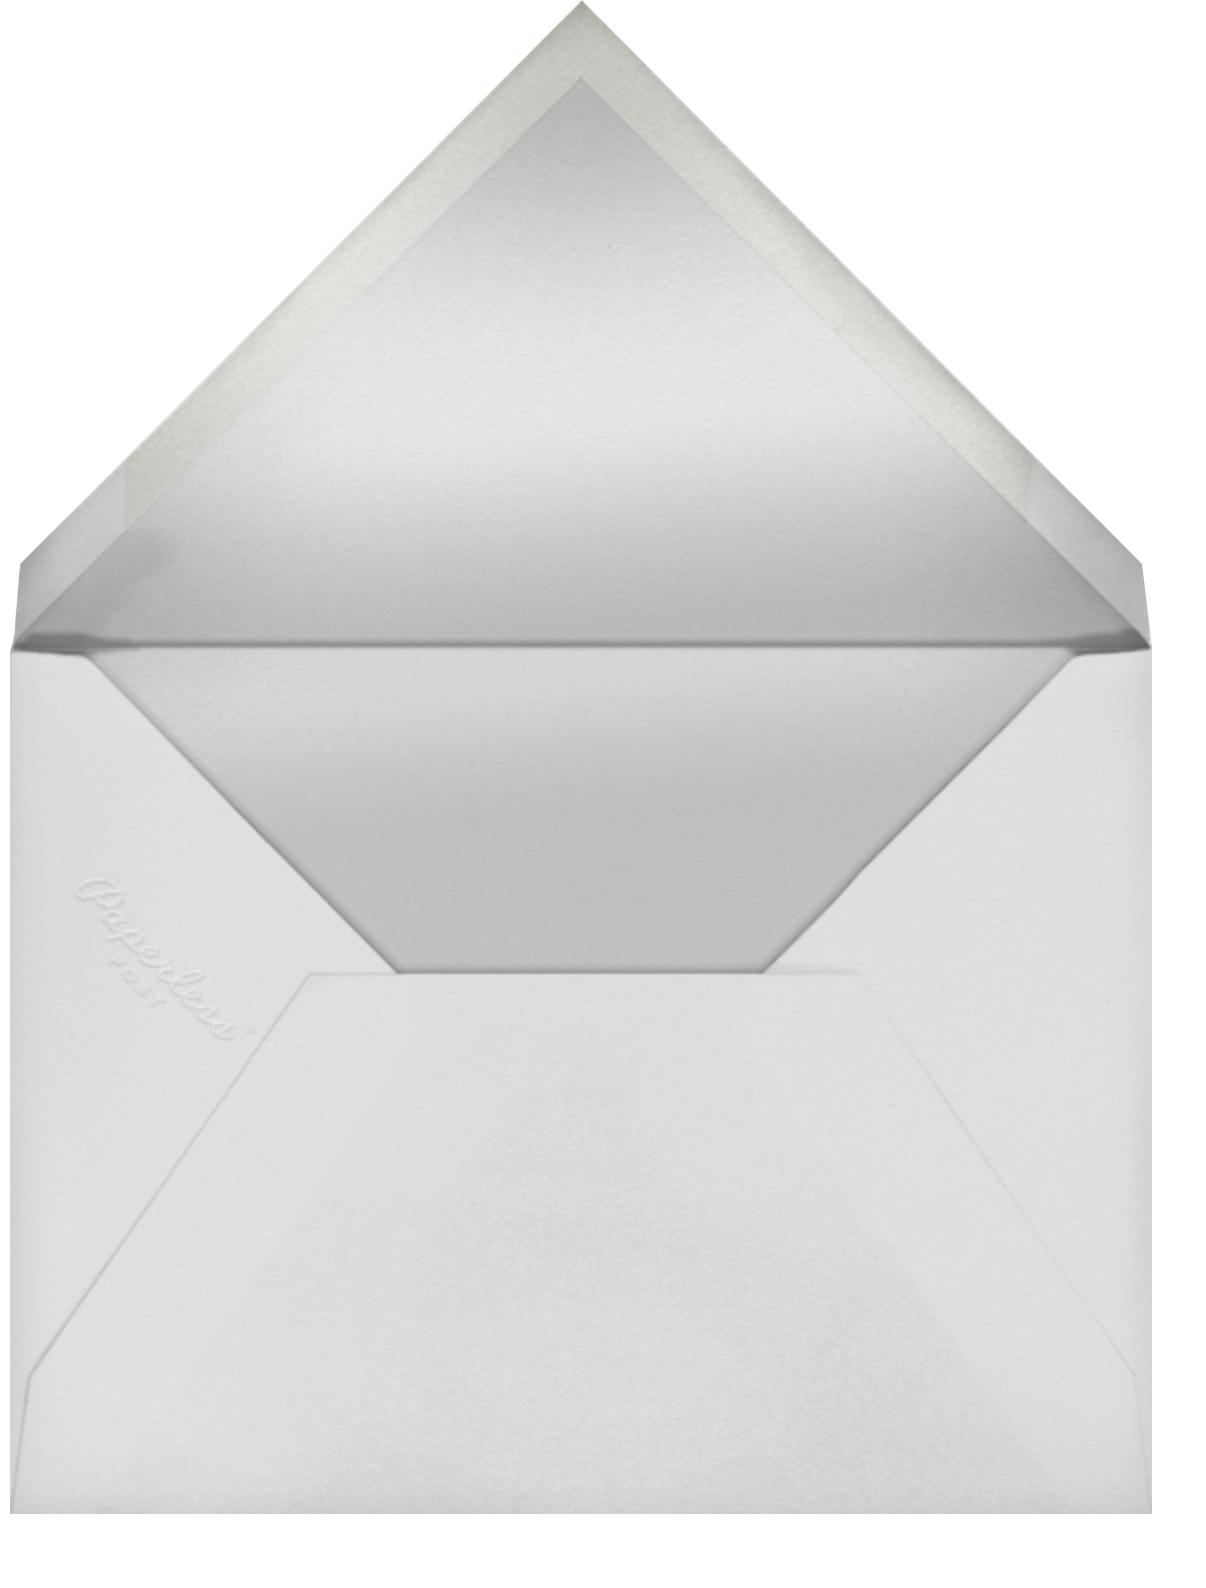 Gradient Messy Strokes - Black - Paperless Post - Adult birthday - envelope back